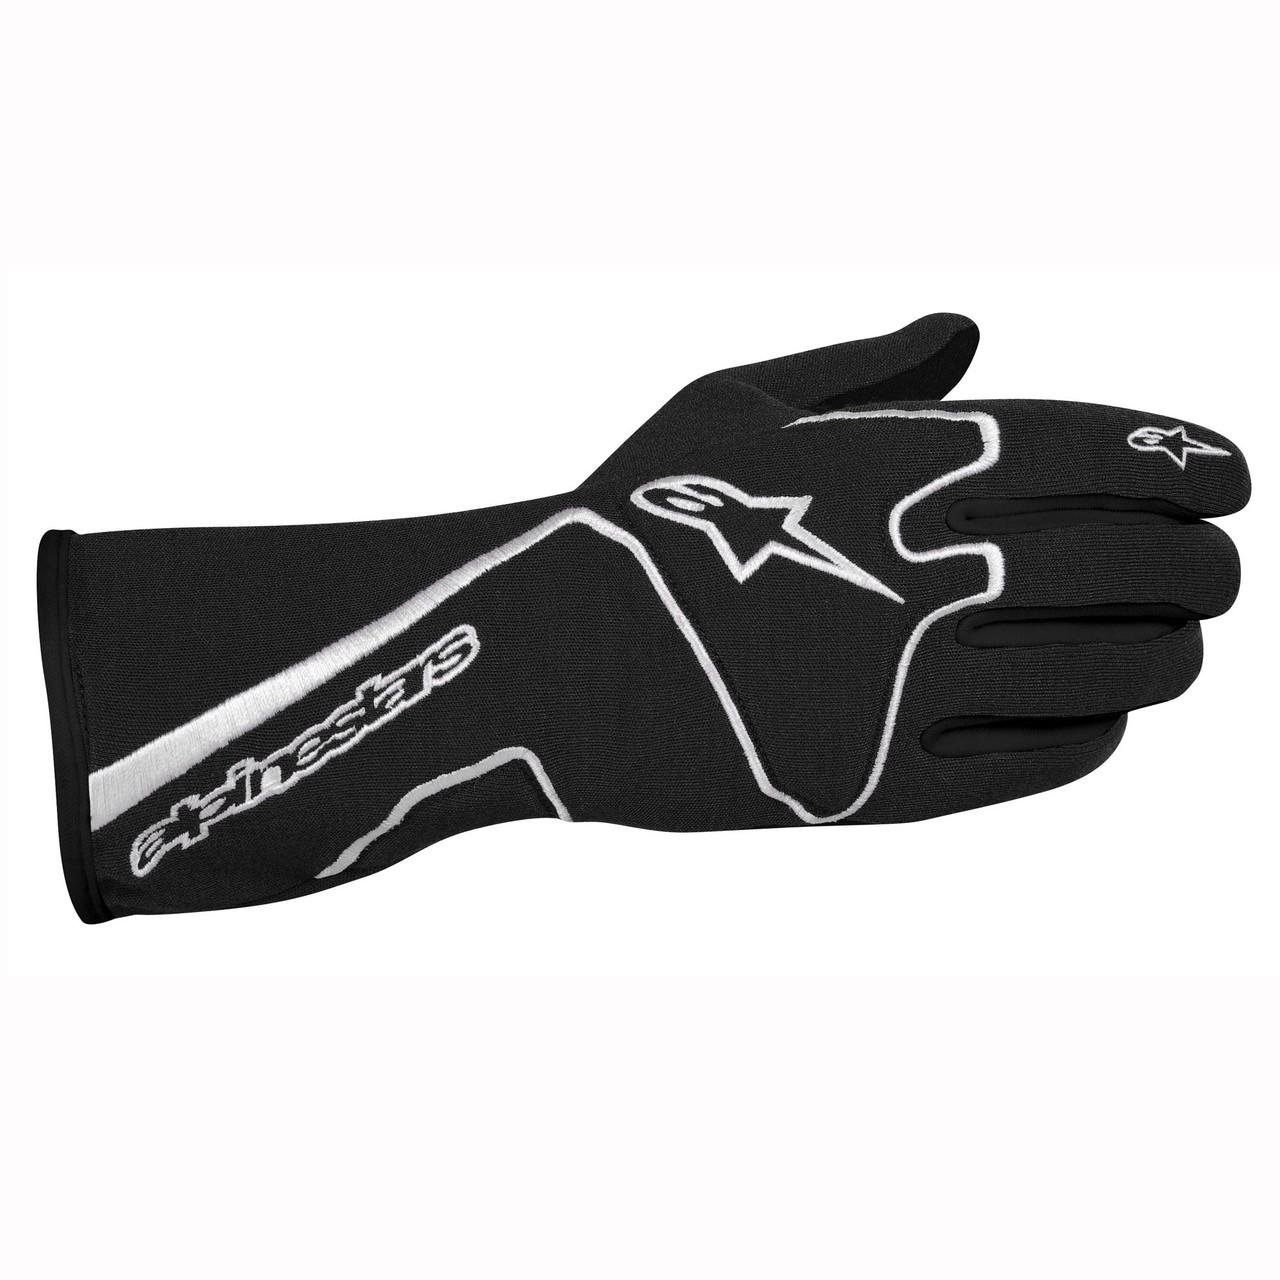 Alpinestars Tech 1 Race Glove -black/white -CLEARANCE